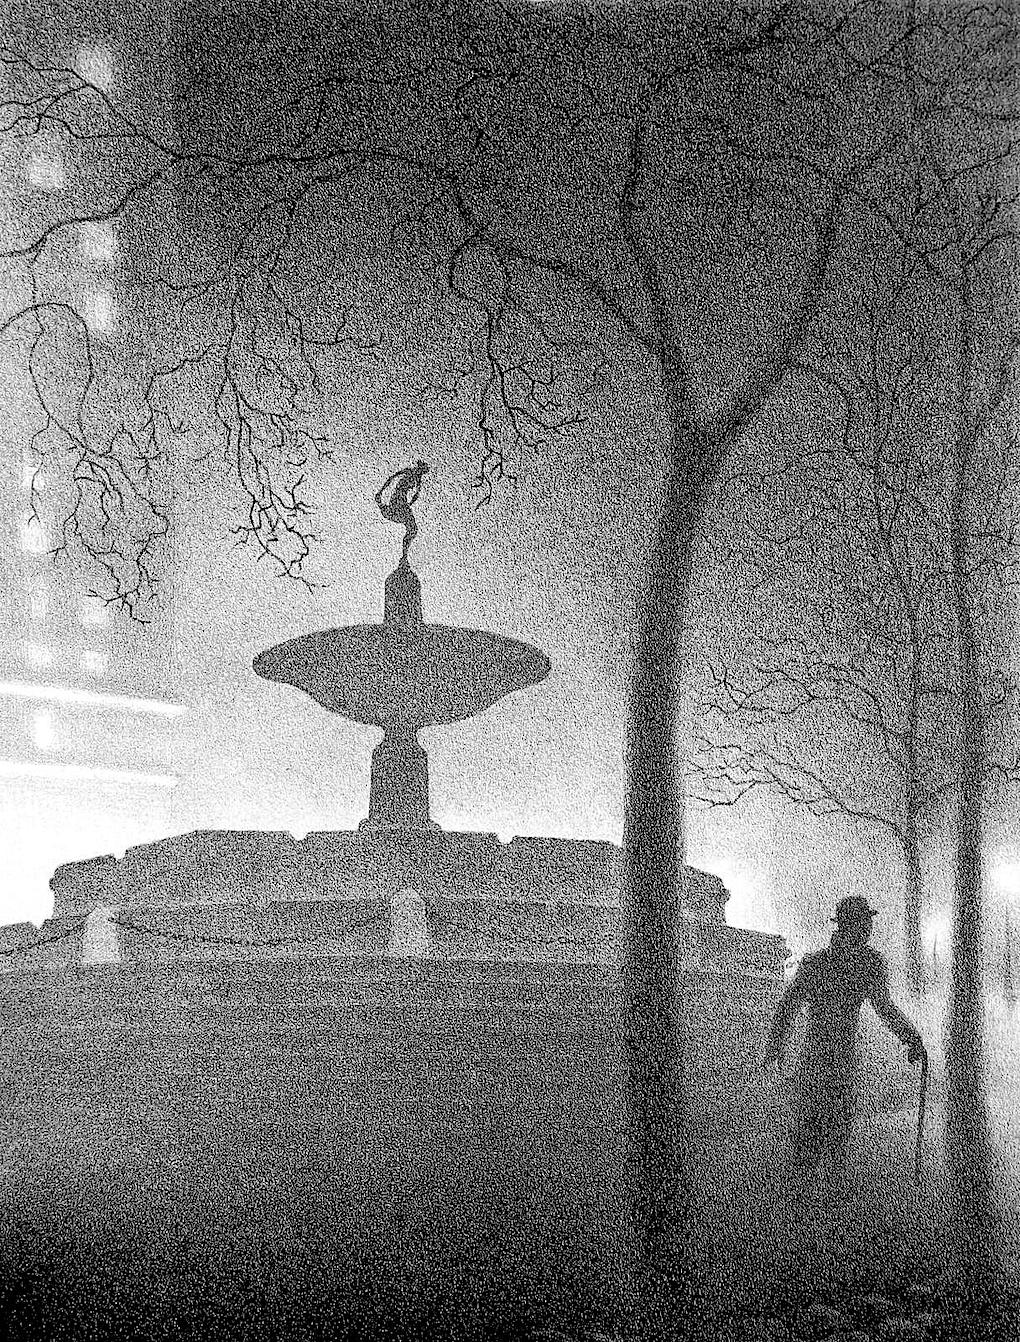 Ellison Hoover urban fog at night